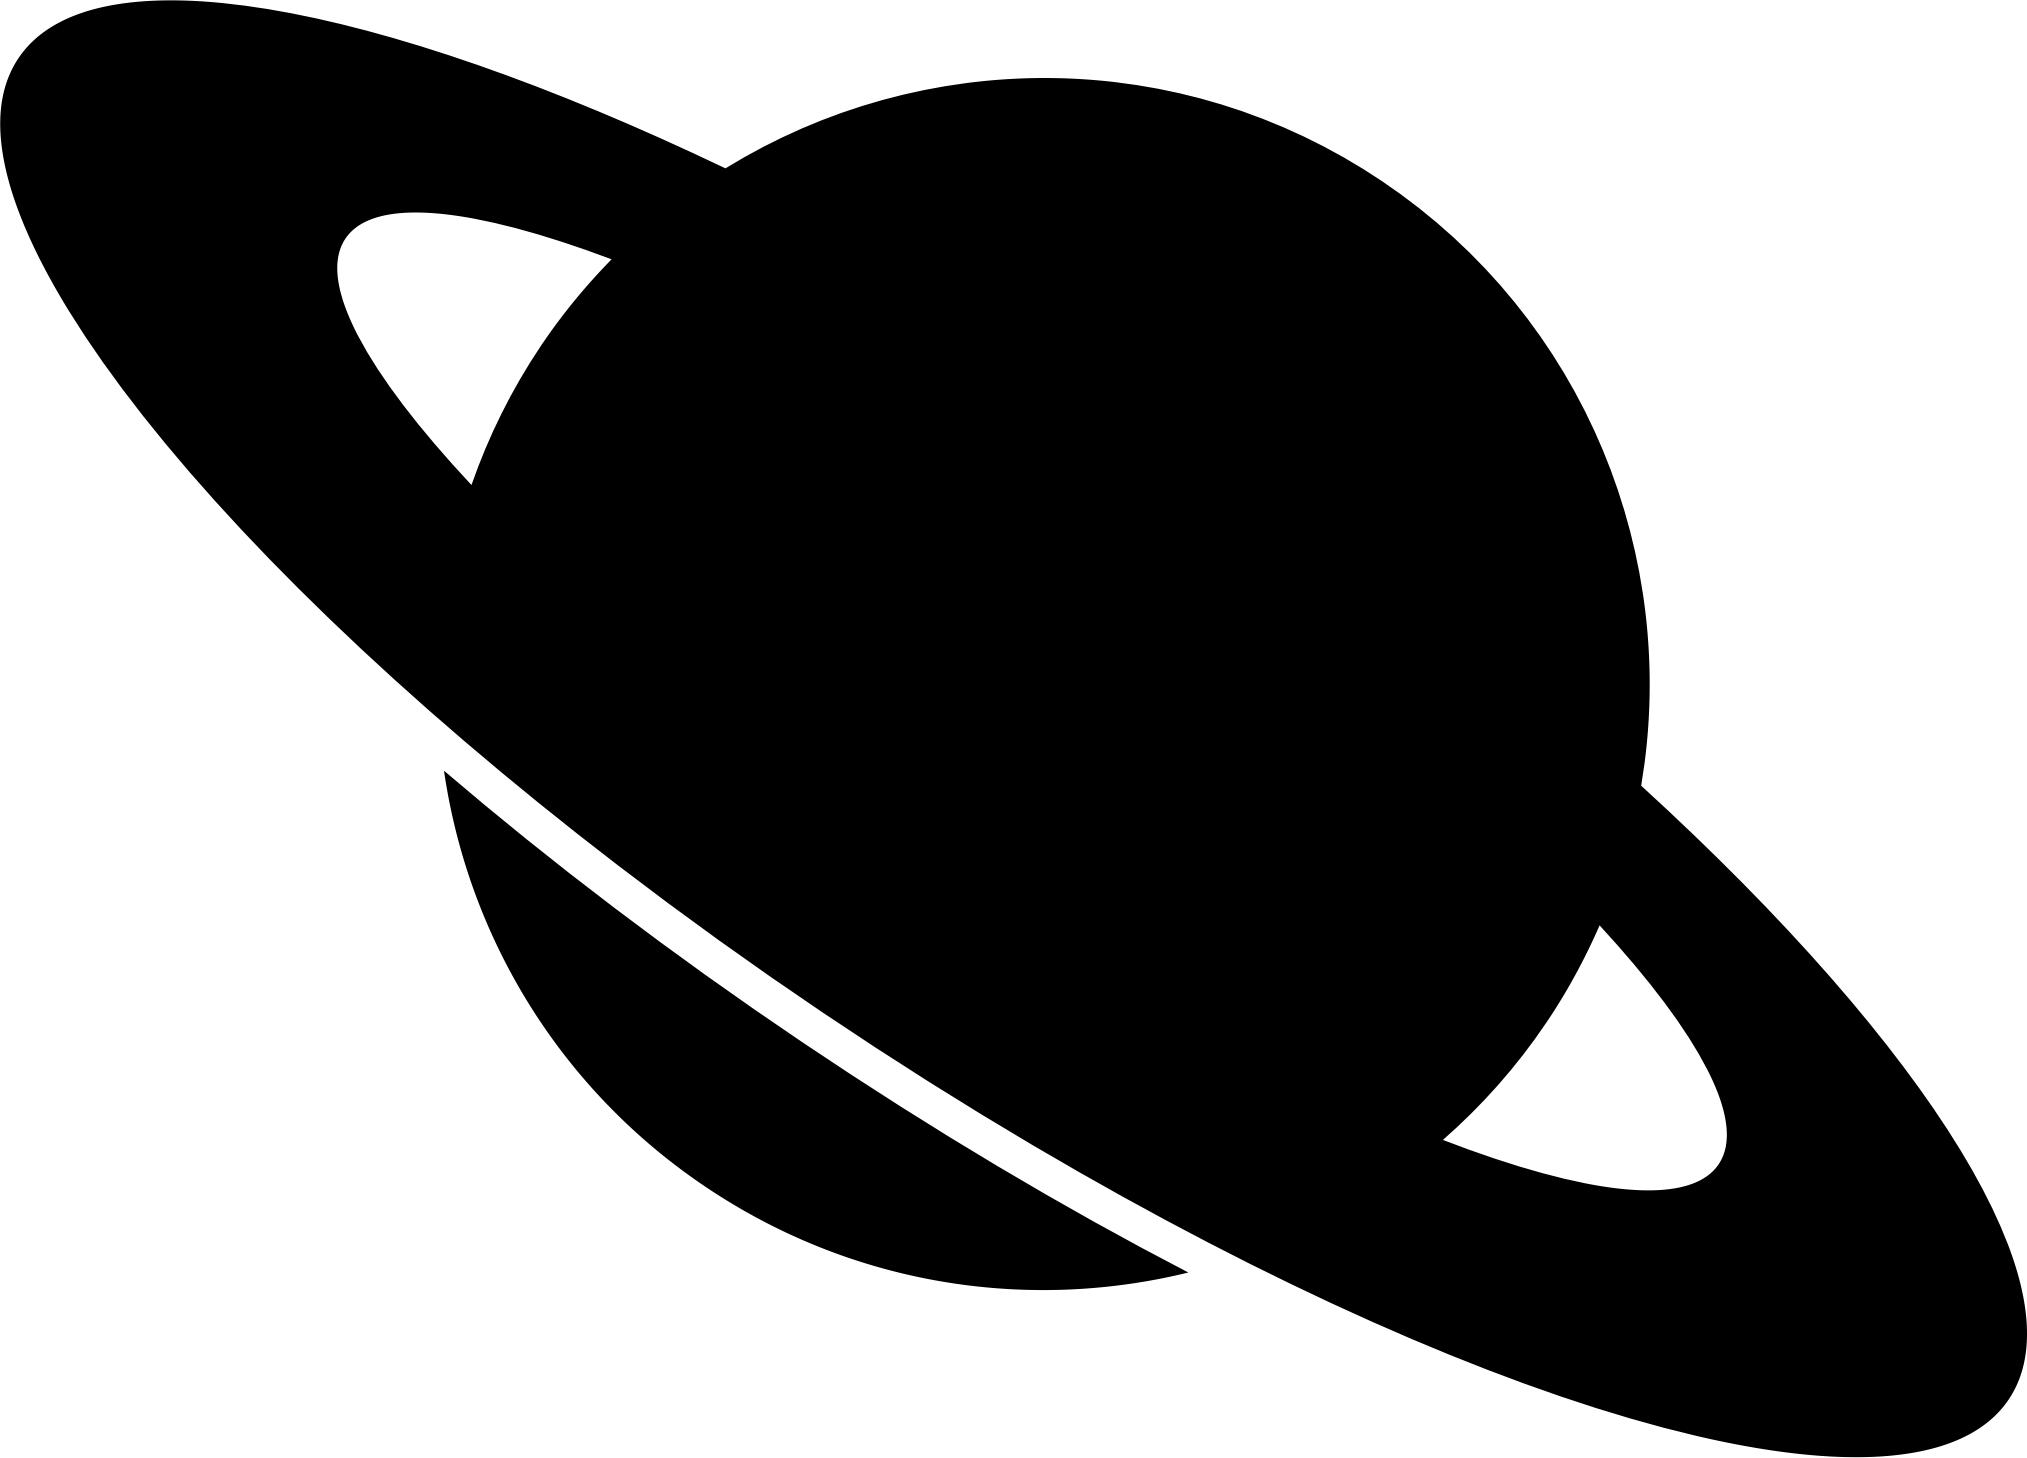 2027x1458 Planet Clipart Silhouette